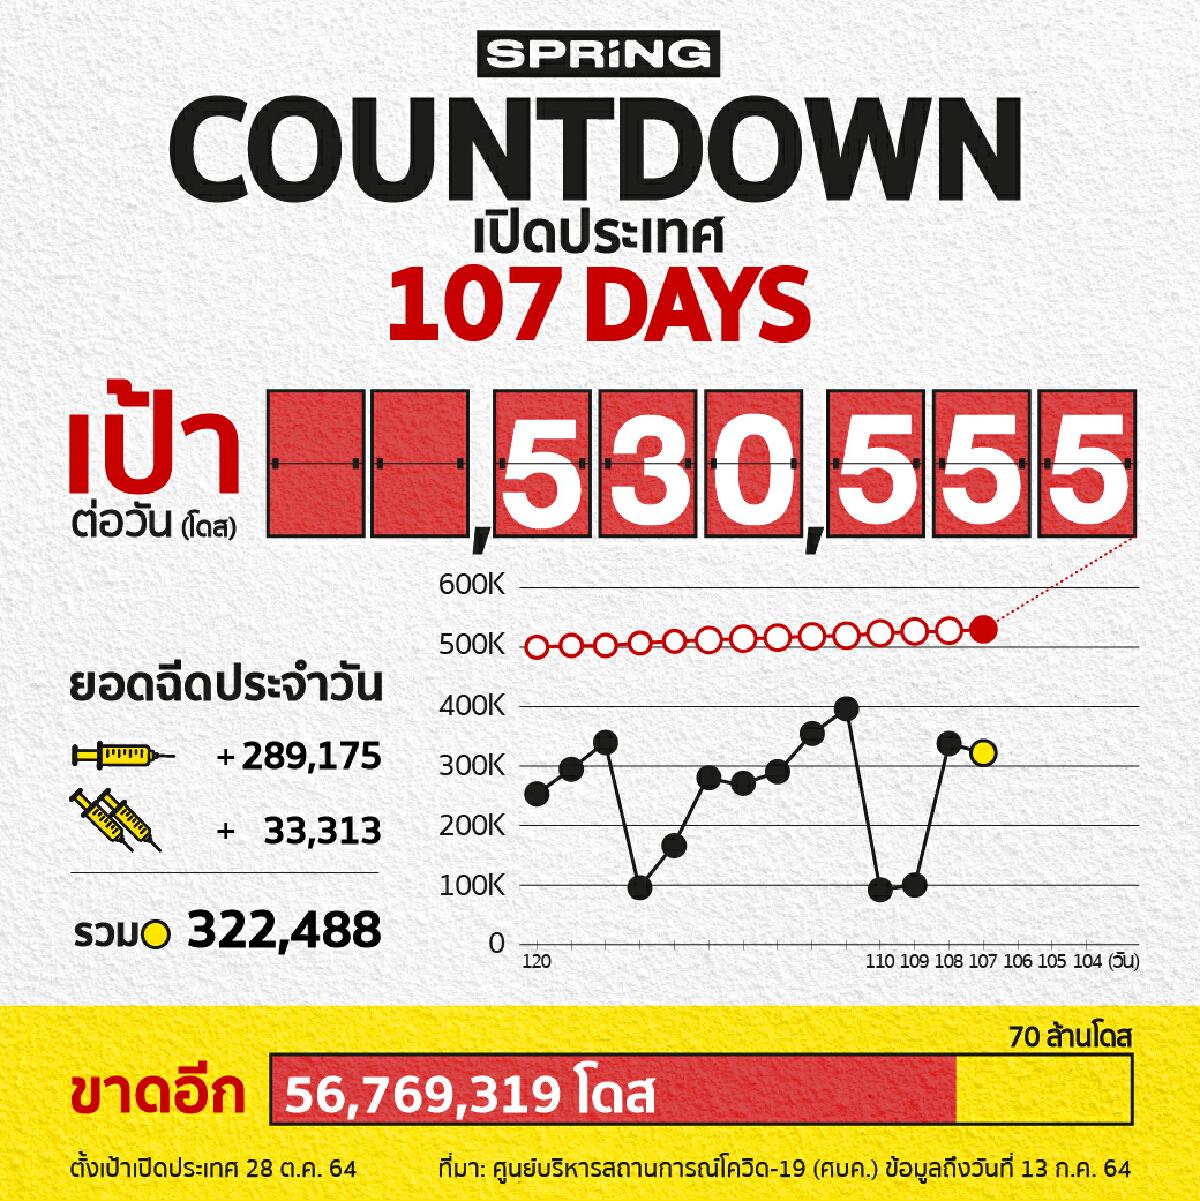 COUNTDOWN! เปิดประเทศใน 107 วัน ฉีดวัคซีนได้ 322,488 โดส